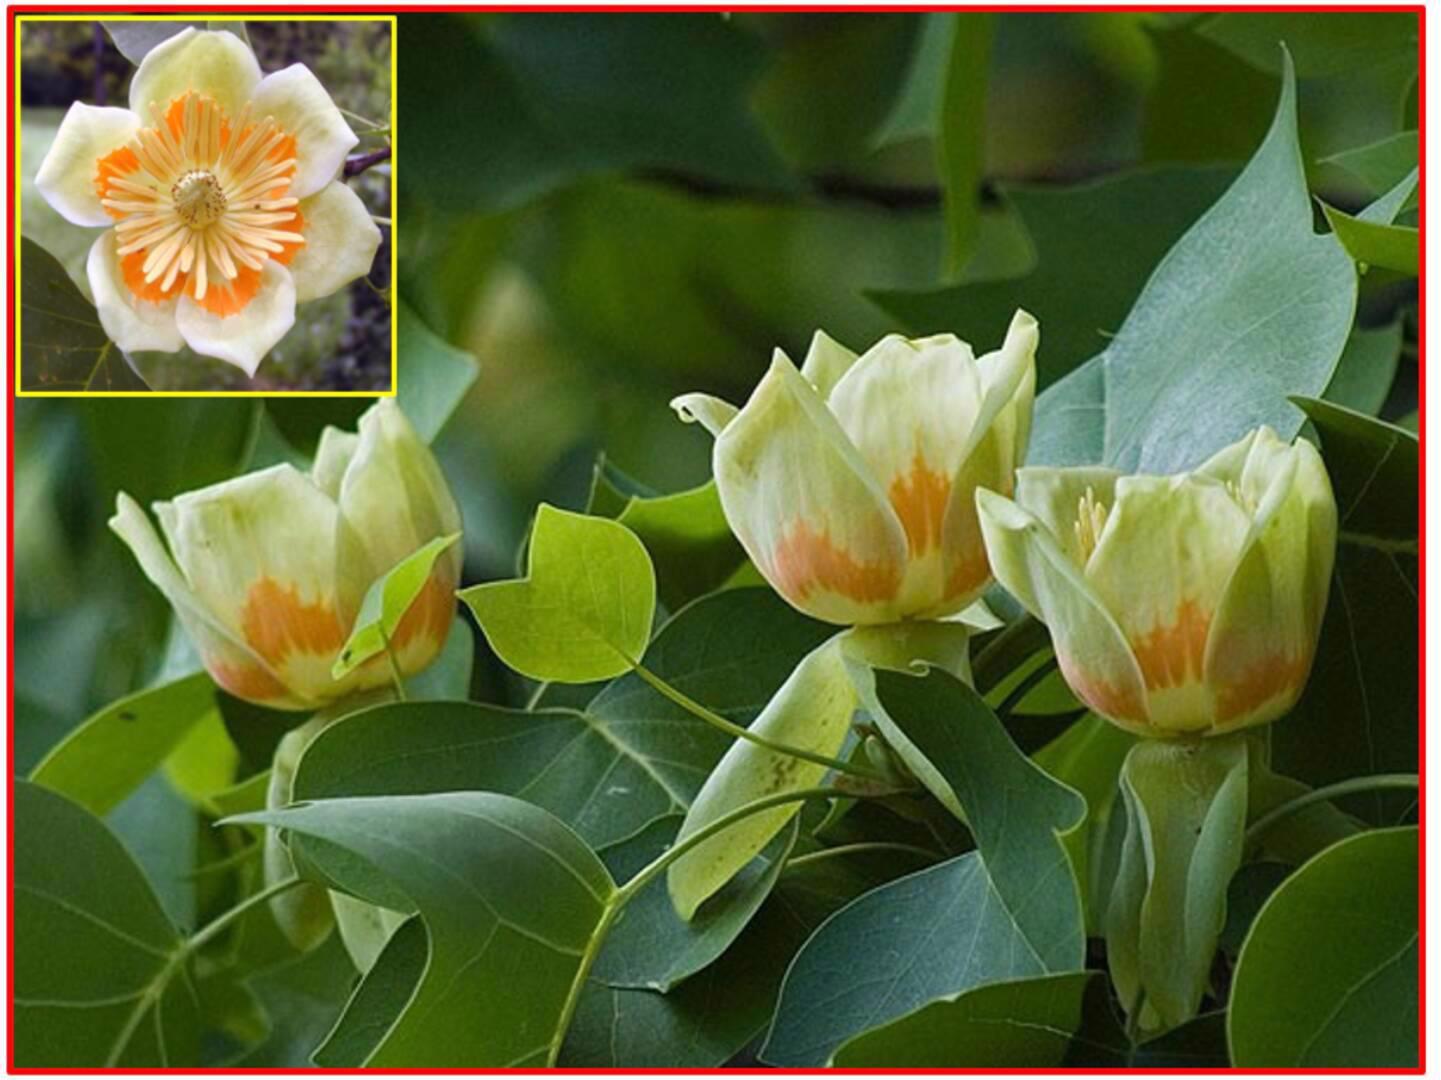 Liriodendron tulipifera - Liliovník tulipánokvětý - foto 1